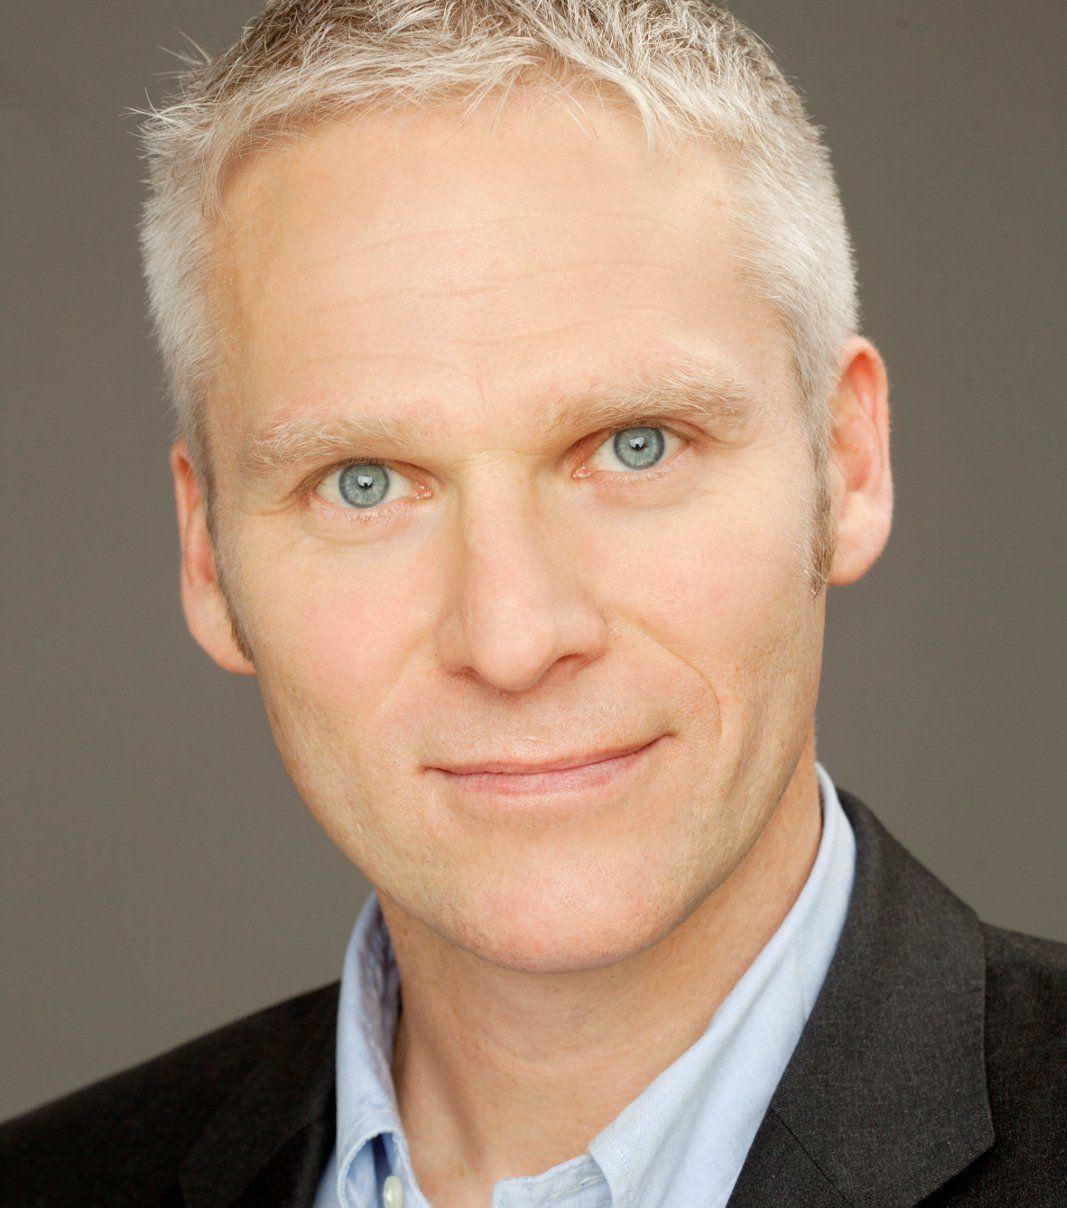 Norgessjef i Dustin home, Jens Haviken.Foto: Dustin home